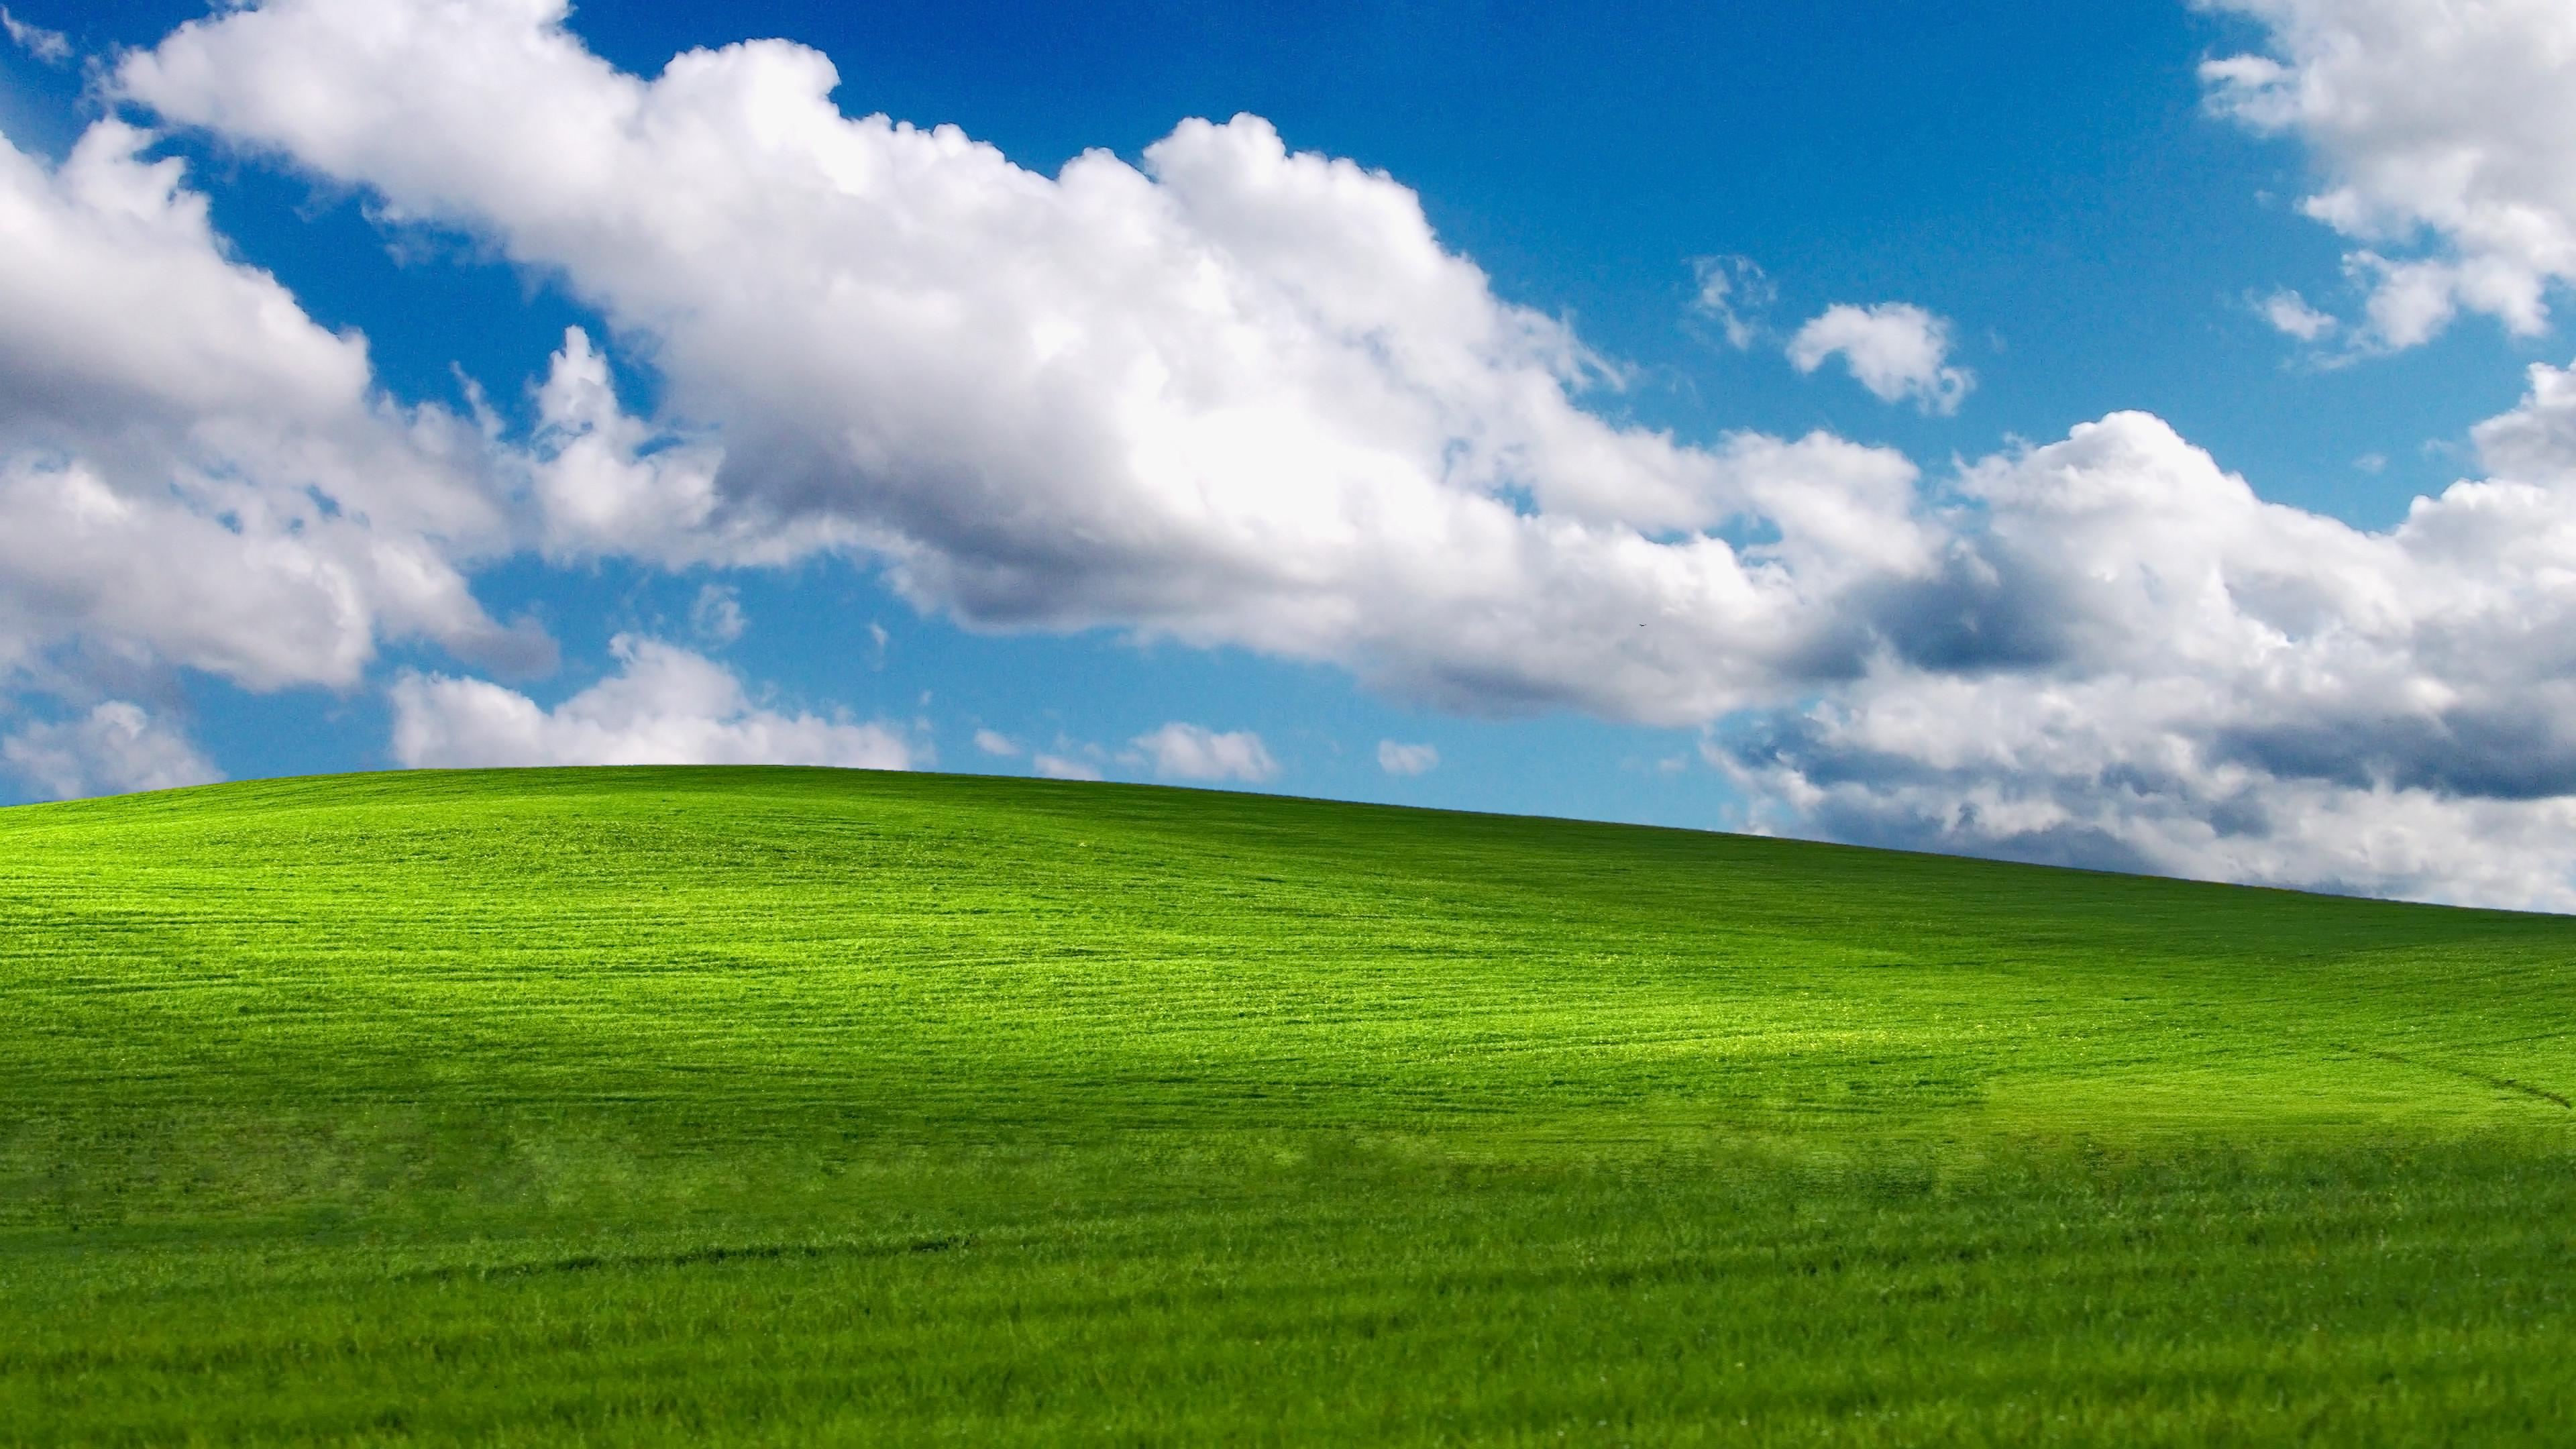 Windows xp backgrounds wallpapertag - Windows wallpaper themes free ...